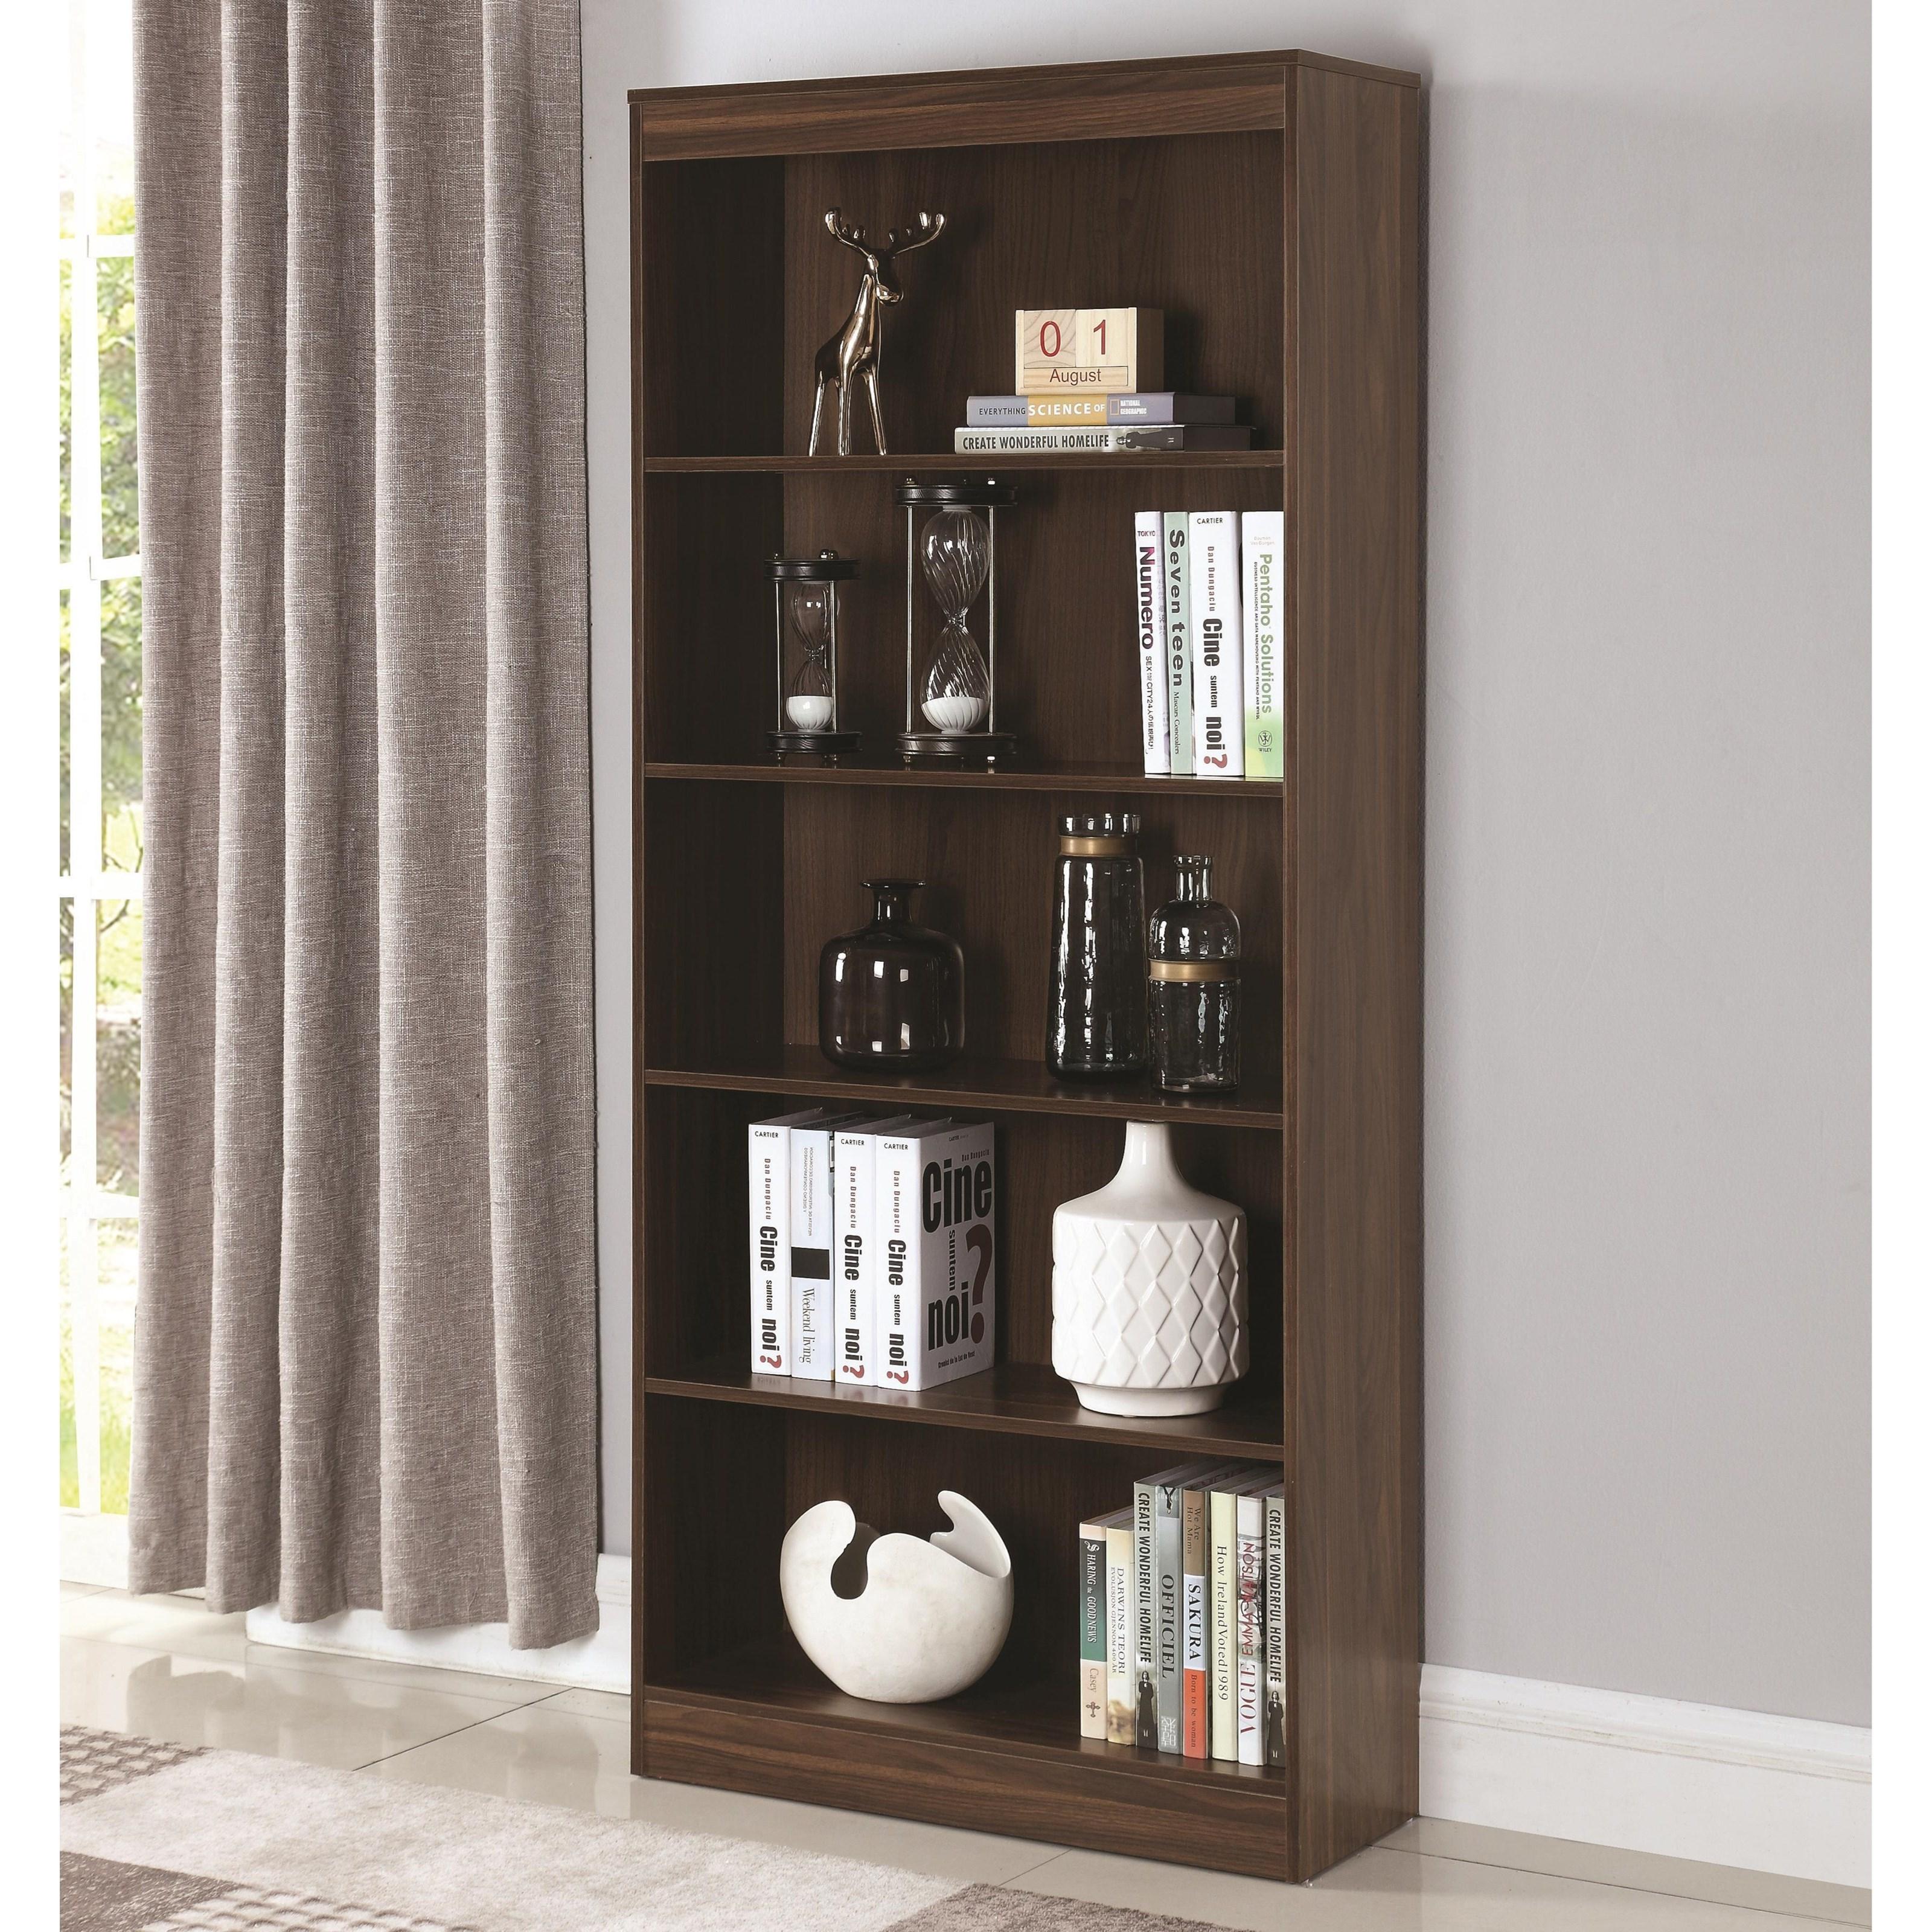 Coaster Bookcases 801808 5 Shelf Transitional Bookcase Dunk